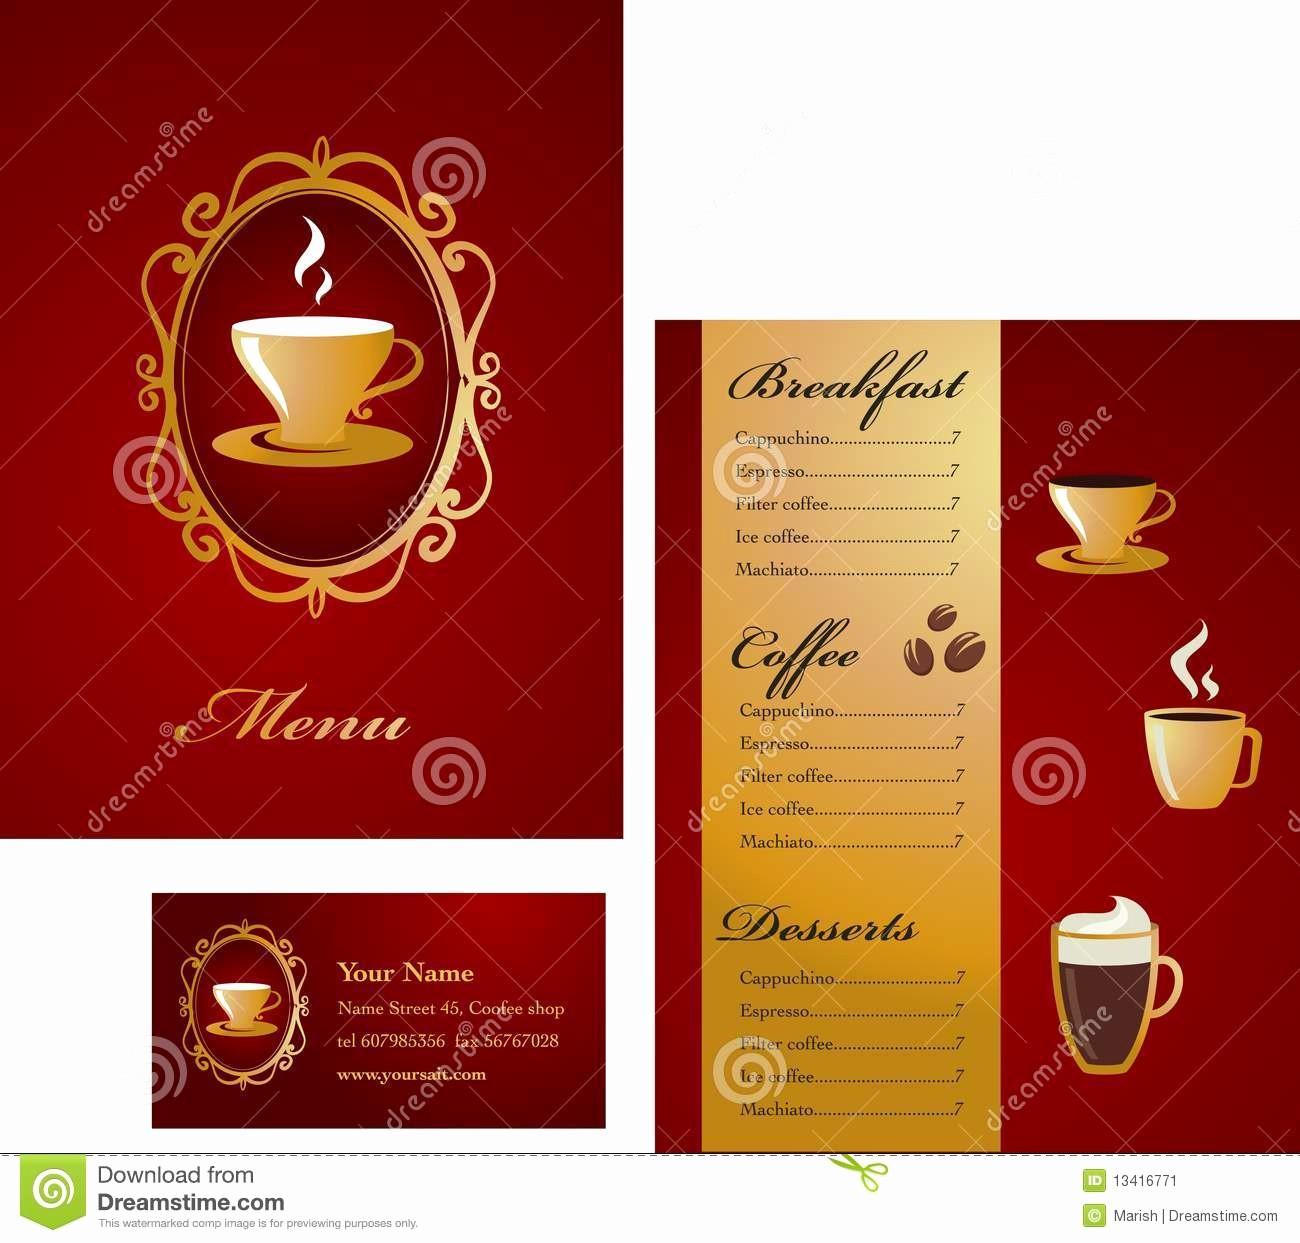 Menu Card Template Free Download New Card Menu Card Template